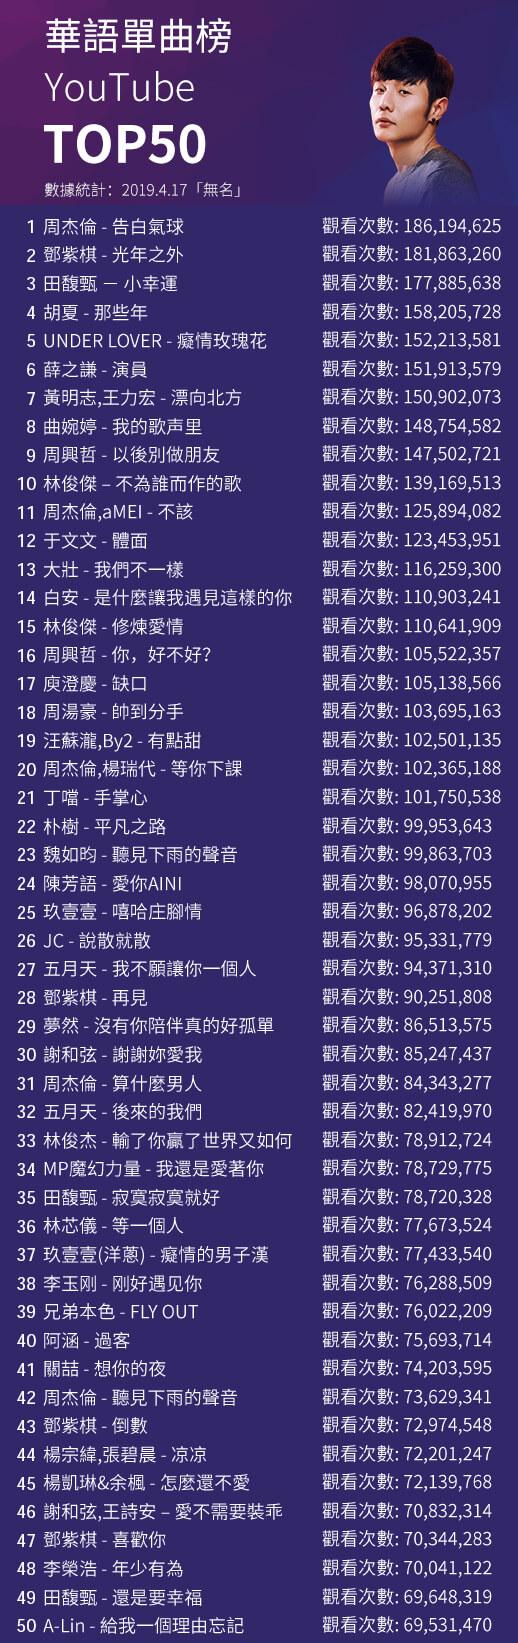 YouTube華語單曲點閱率Top50-無名誌